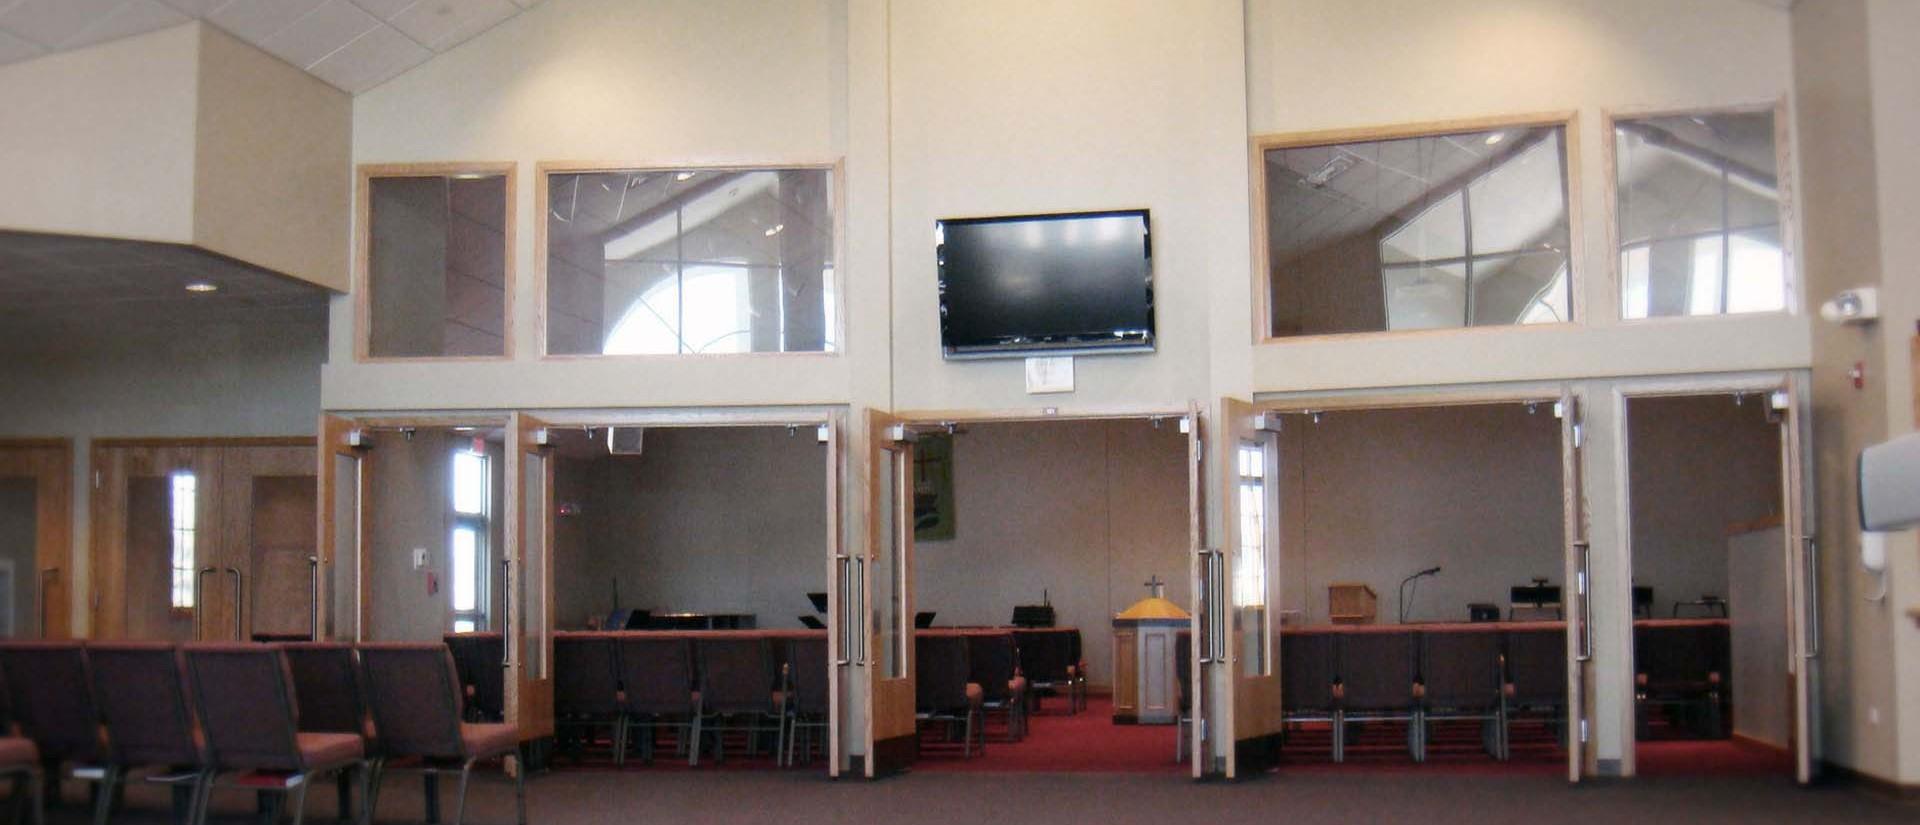 Church Lobby